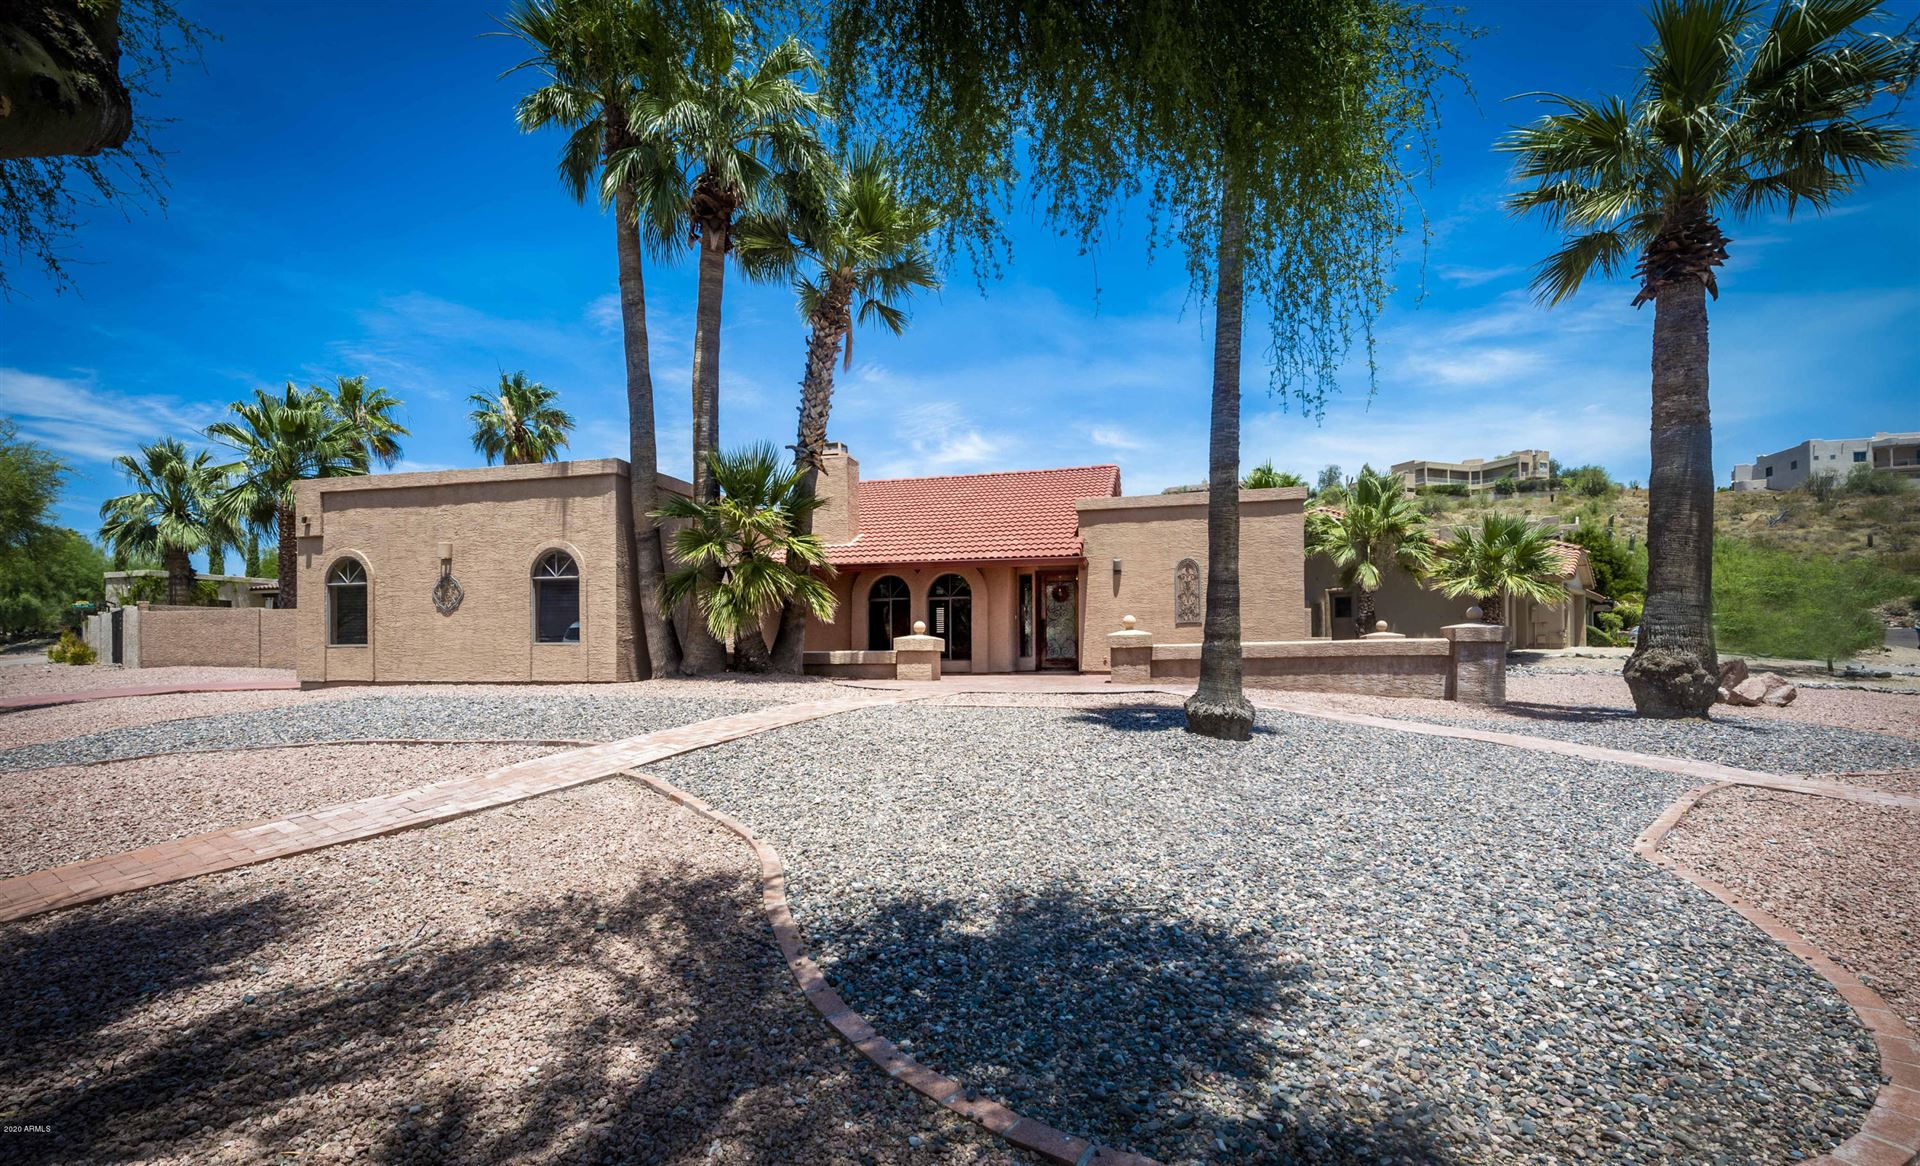 Photo of 16035 N ASPEN Drive, Fountain Hills, AZ 85268 (MLS # 6197698)